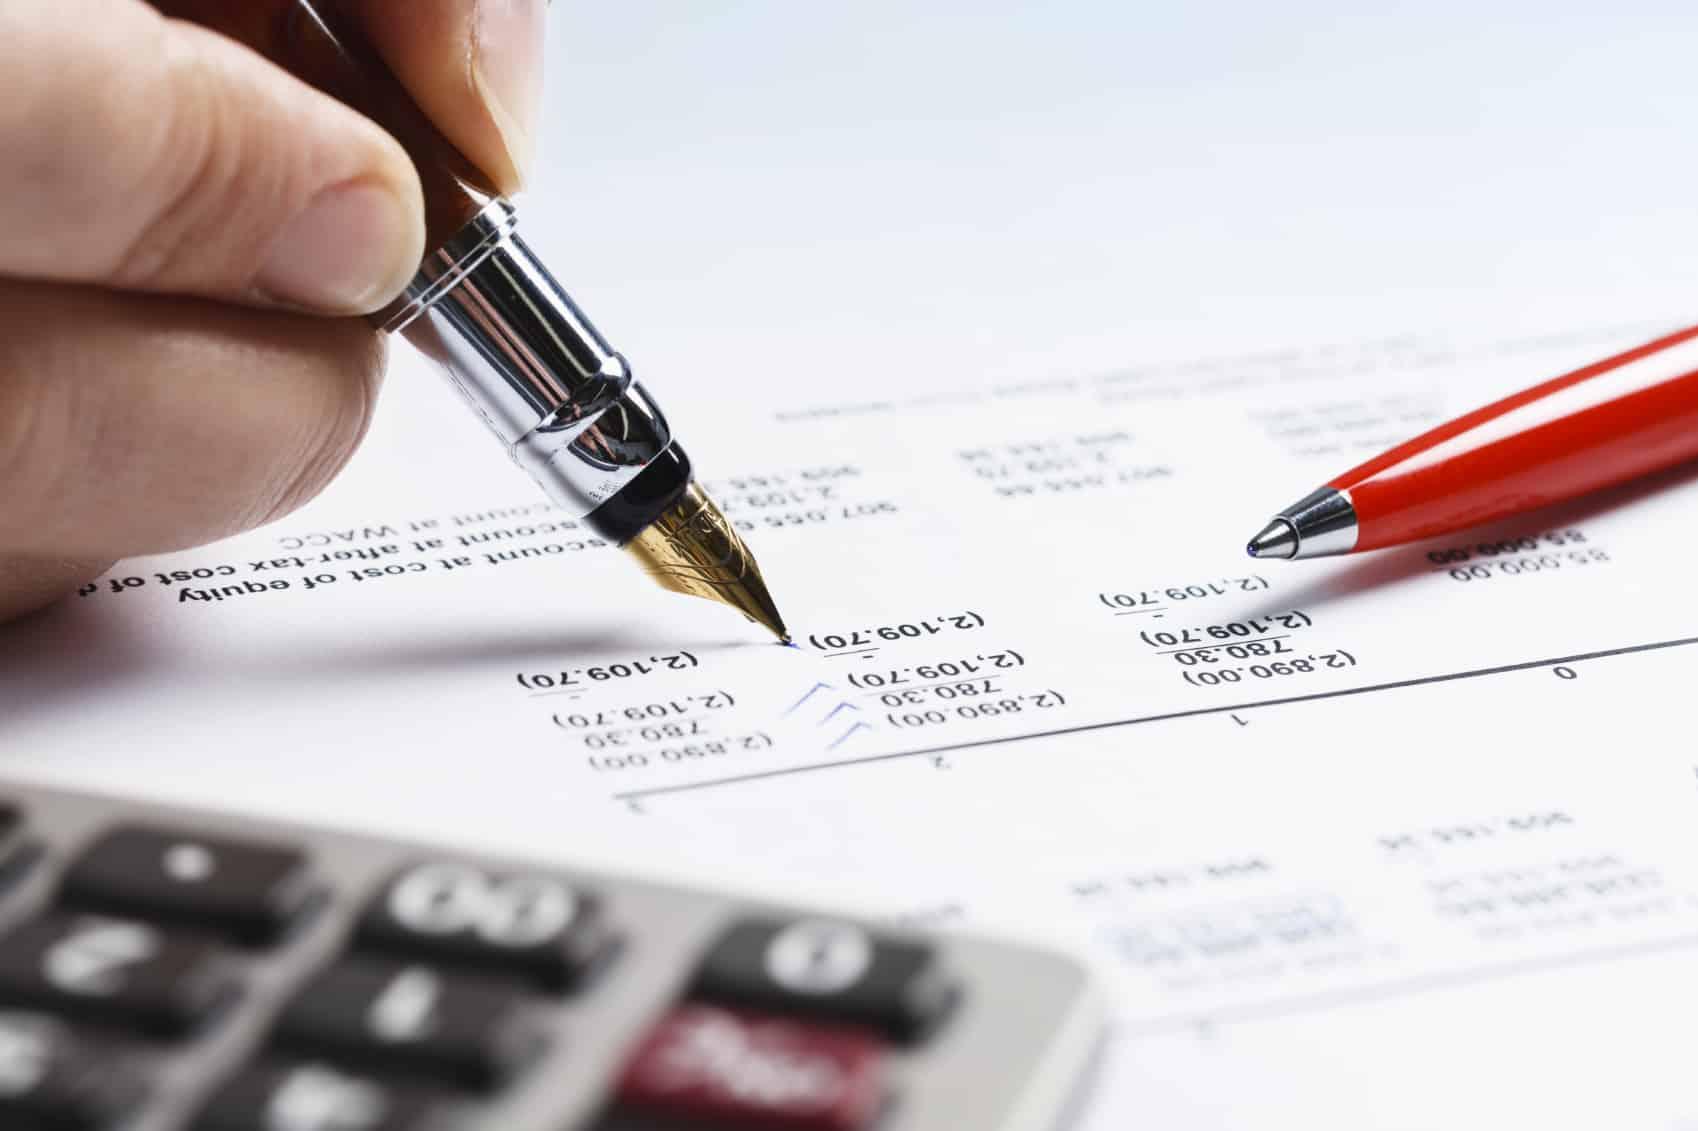 AEGON - Bajada impositiva seguros fiscales